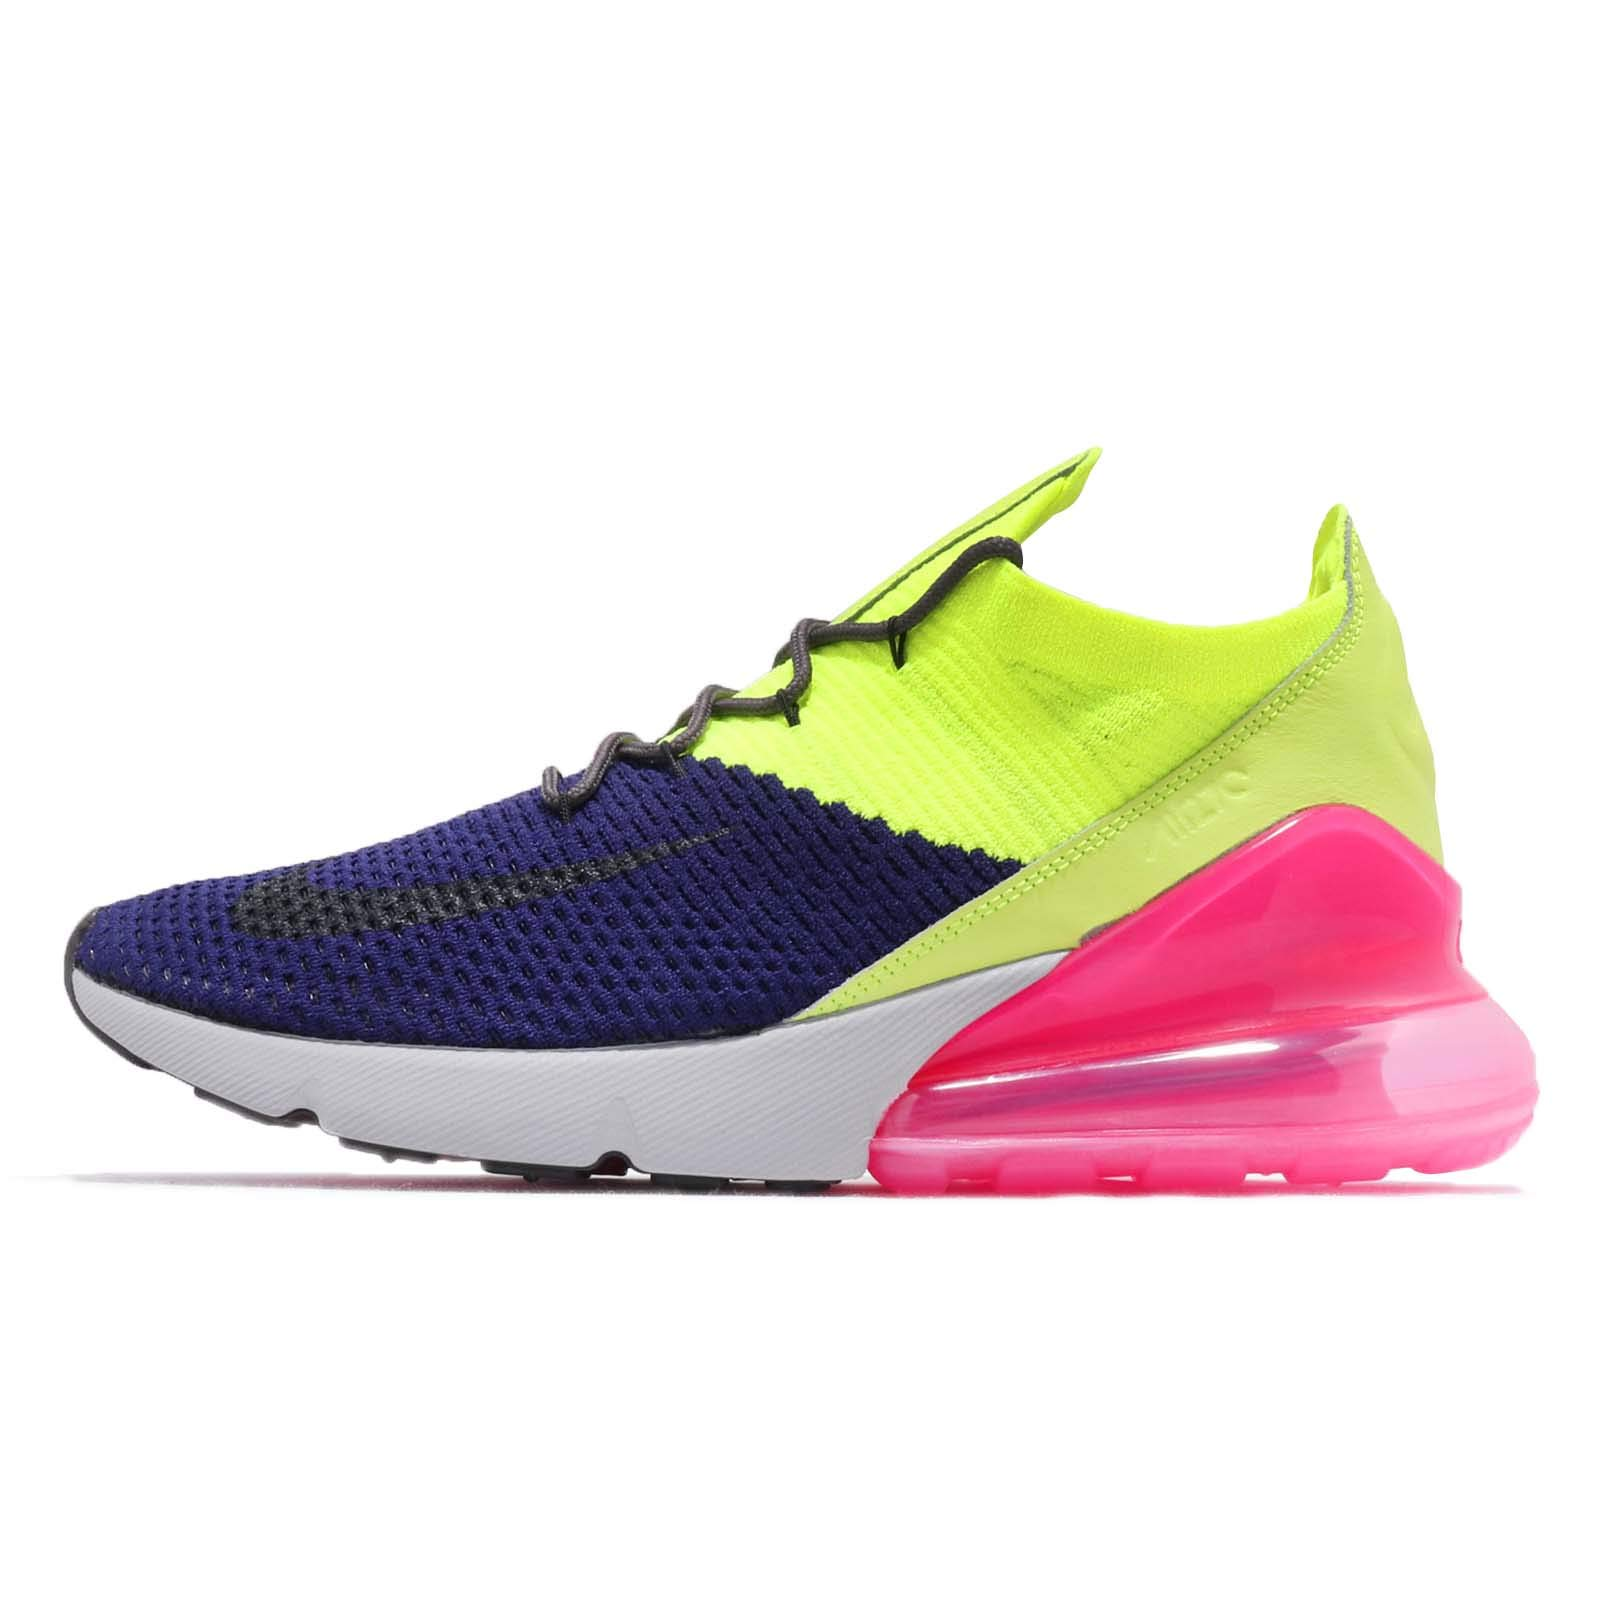 aa29911123842 Nike Men s Air Max 270 Flyknit Regency Purple Thunder Grey Volt Nylon  Basketball Shoes